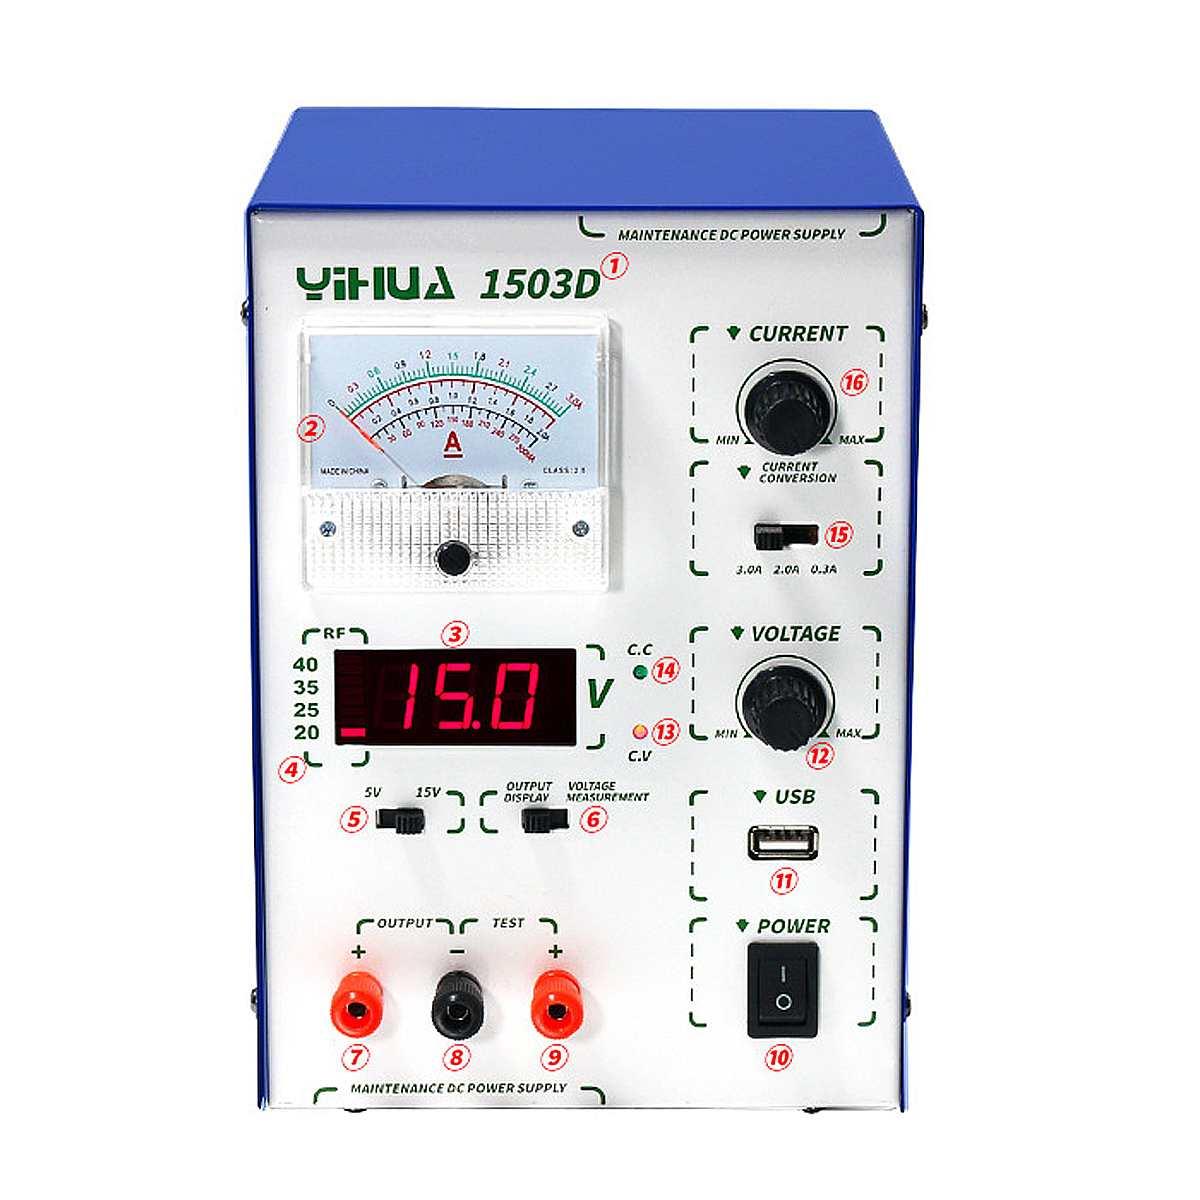 1Pcs 45W Adjustable Digital DC Power Supply Stabilizers Voltage Regulators Power Supply 110V 220V